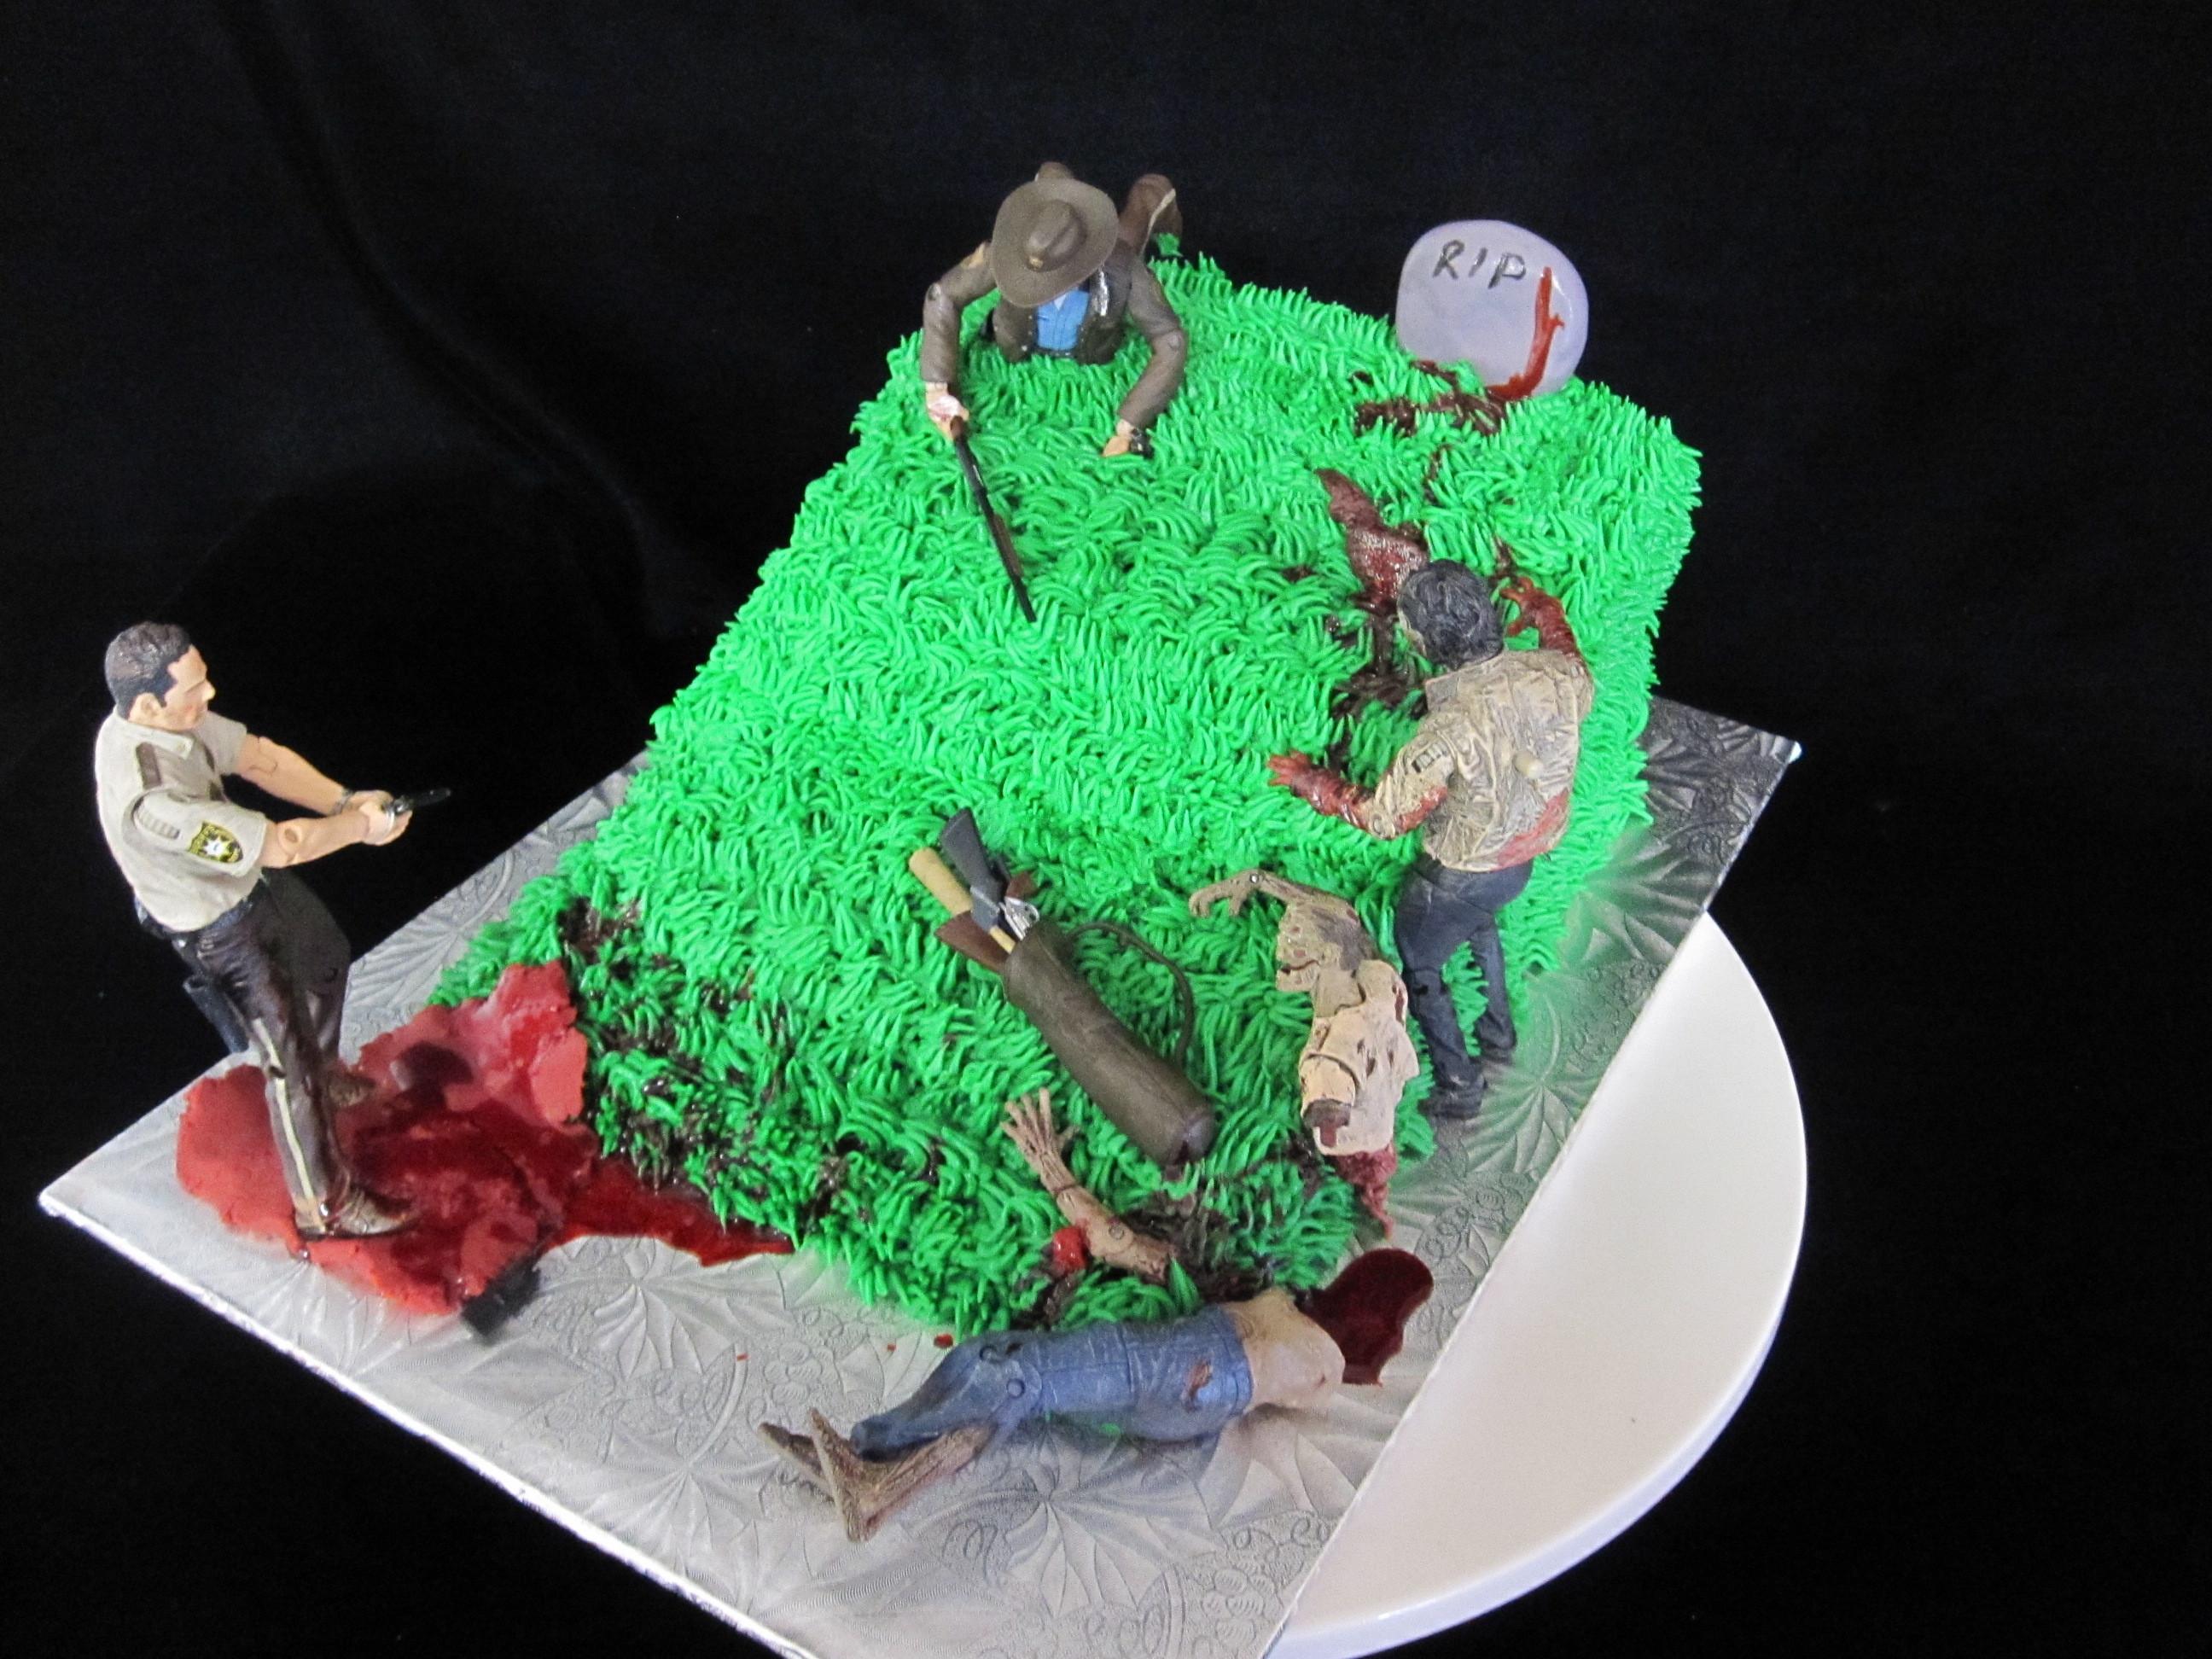 Walking Dead Wedding Cakes  Zombie Groom's Cake Somerset Kentucky